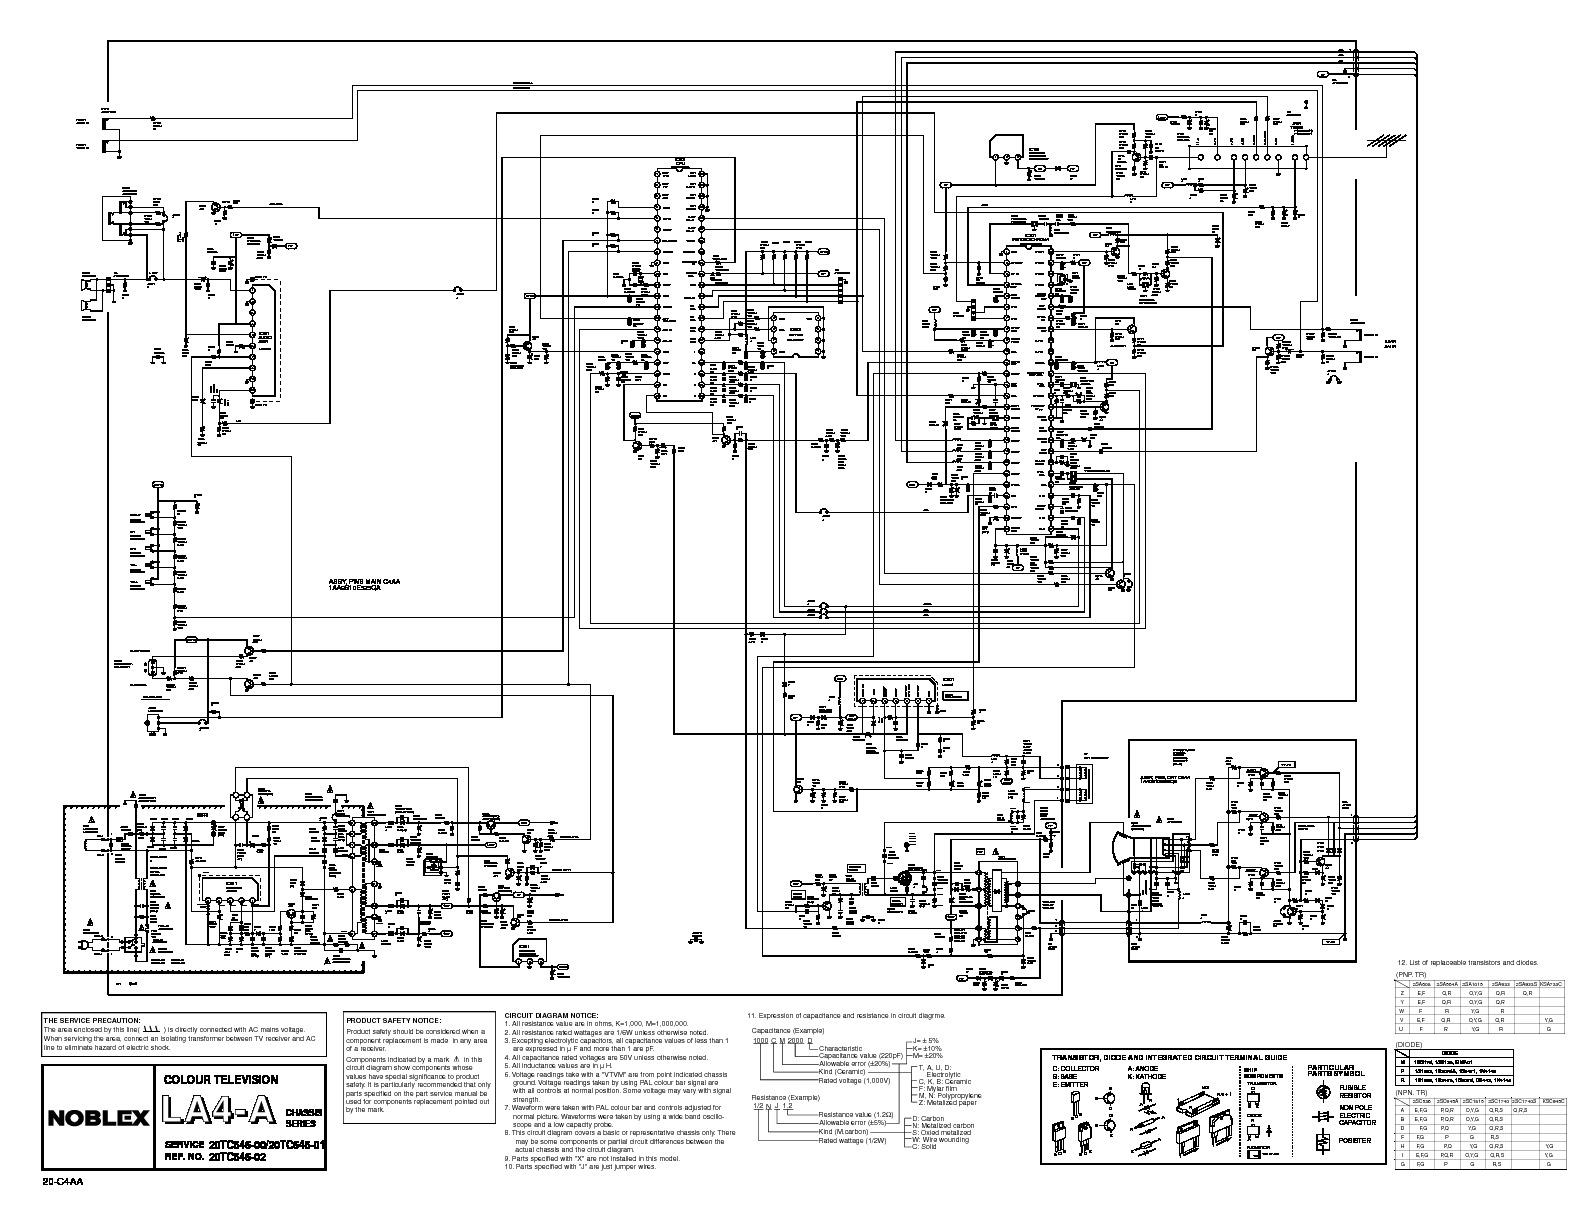 sanyo c29lk34 la4a sanyo c29lk34 chassis la4a pdf